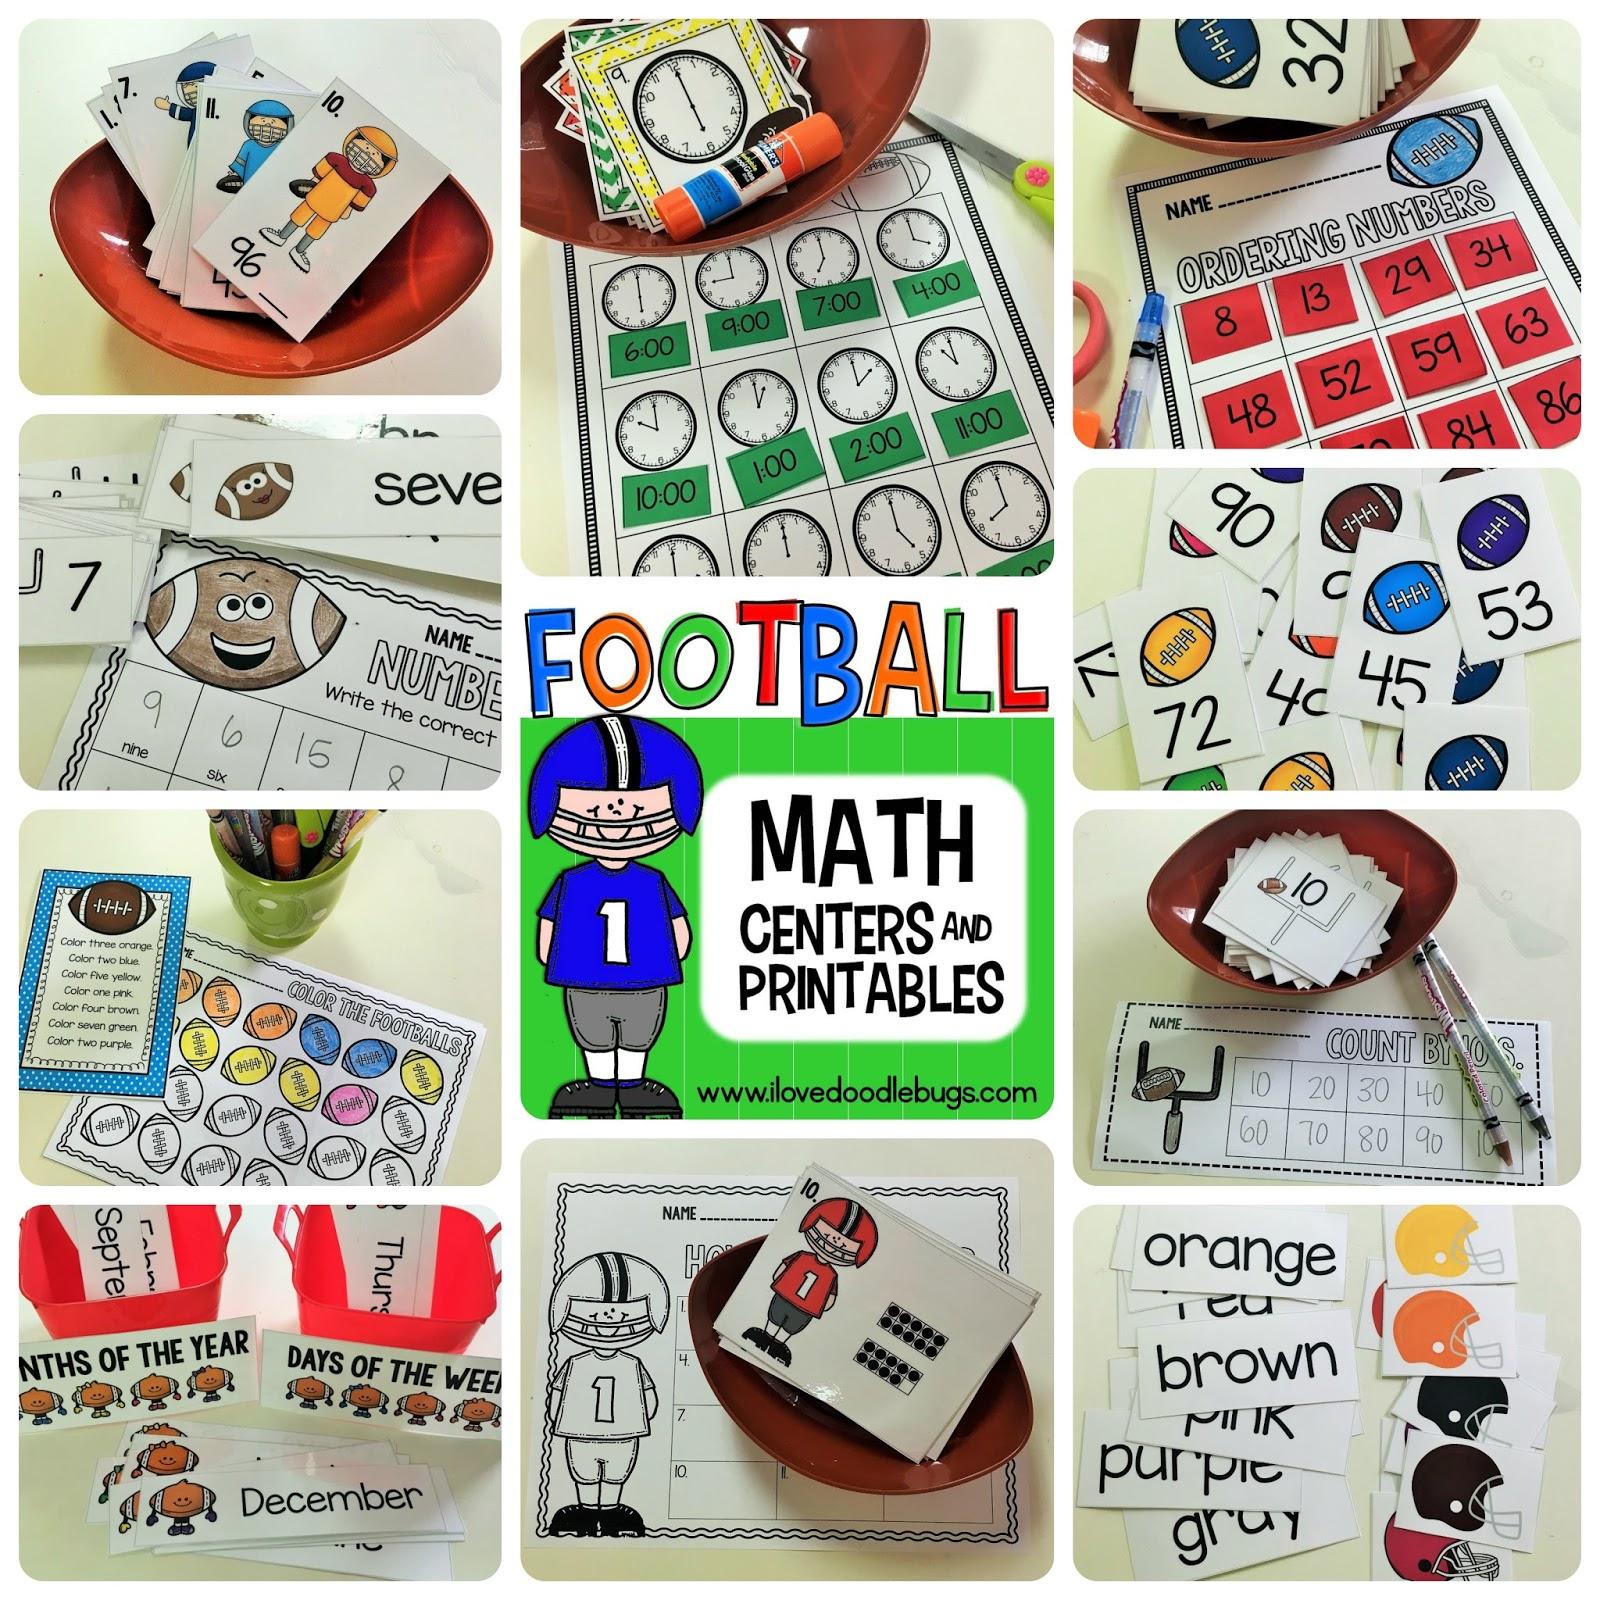 Football Math Centers + Printables   Doodle Bugs Teaching   Bloglovin\'